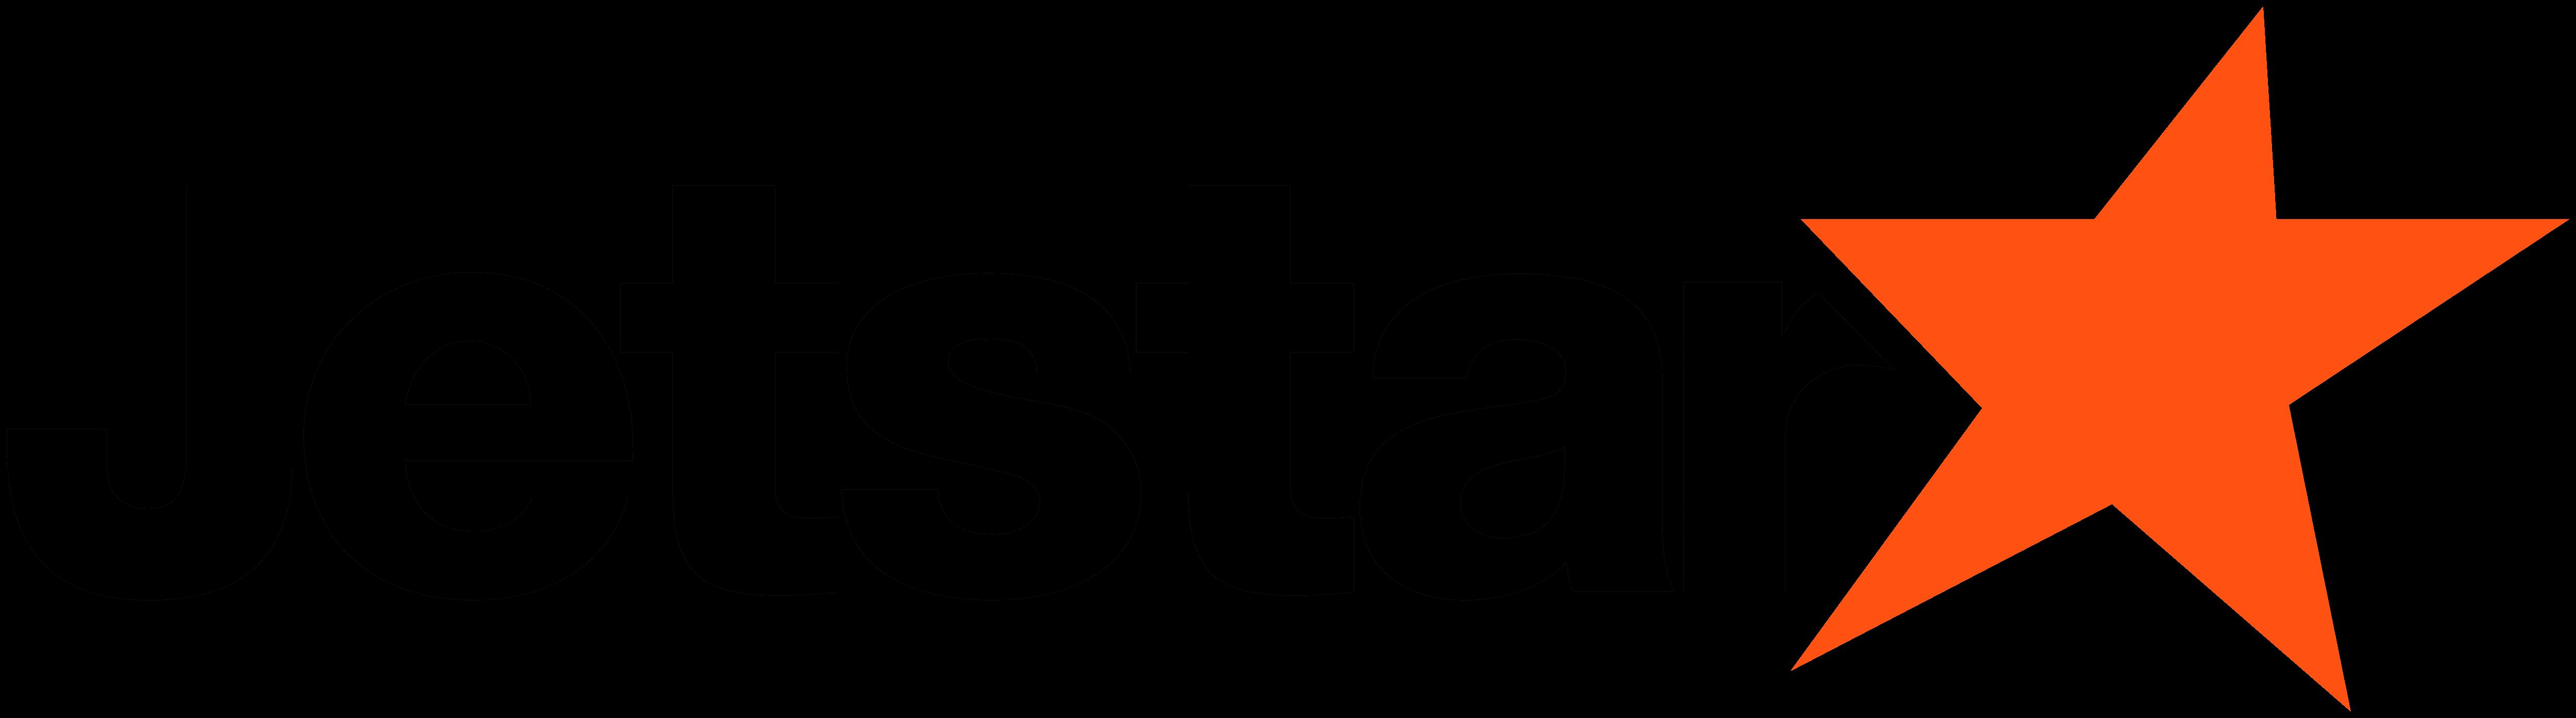 jetstar airways logo